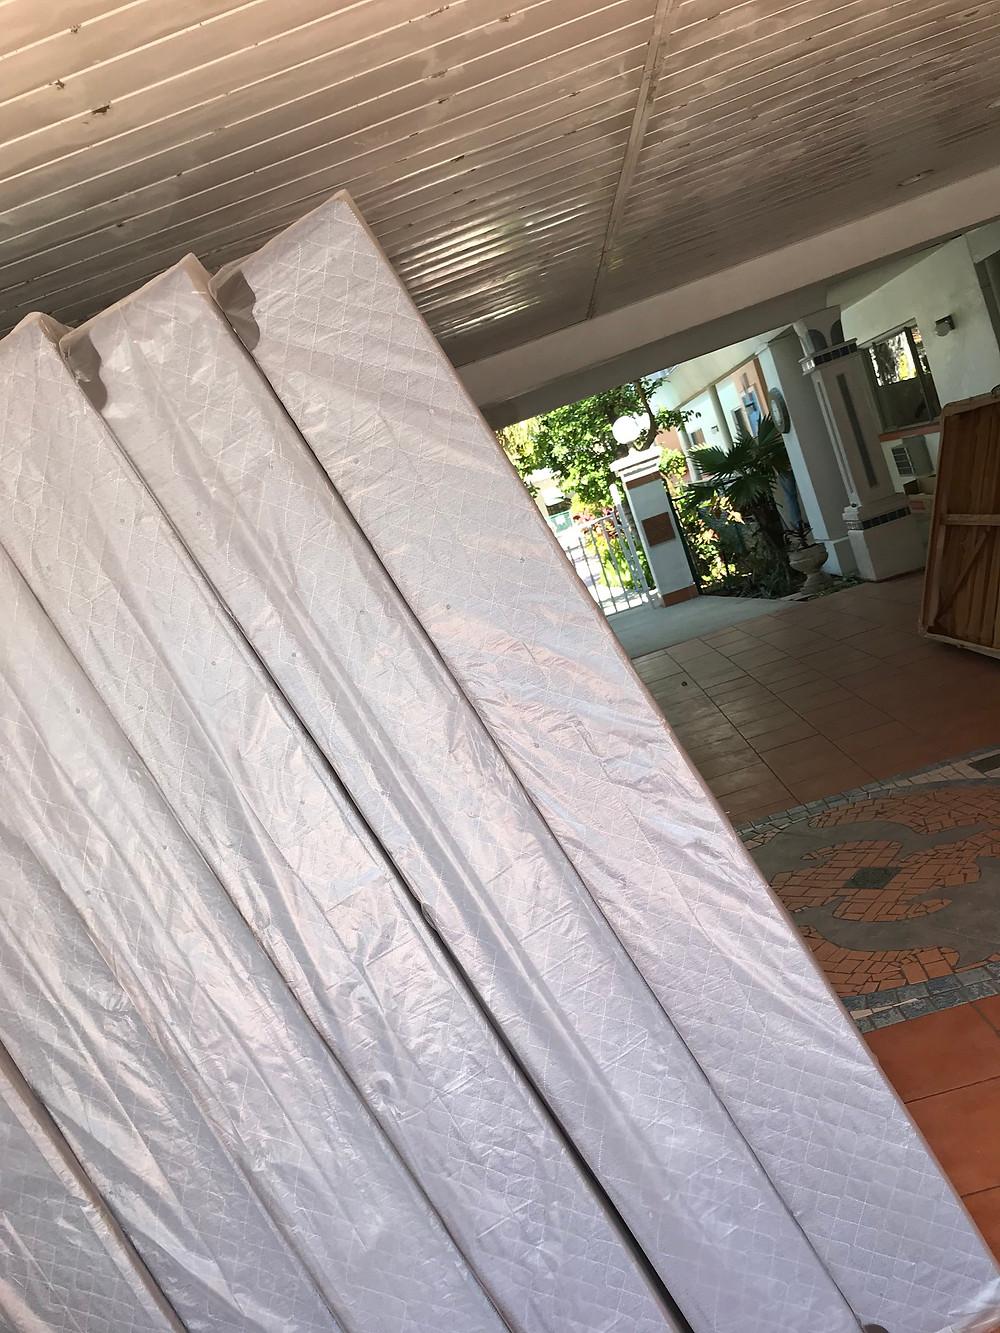 stacks of brand new mattresses